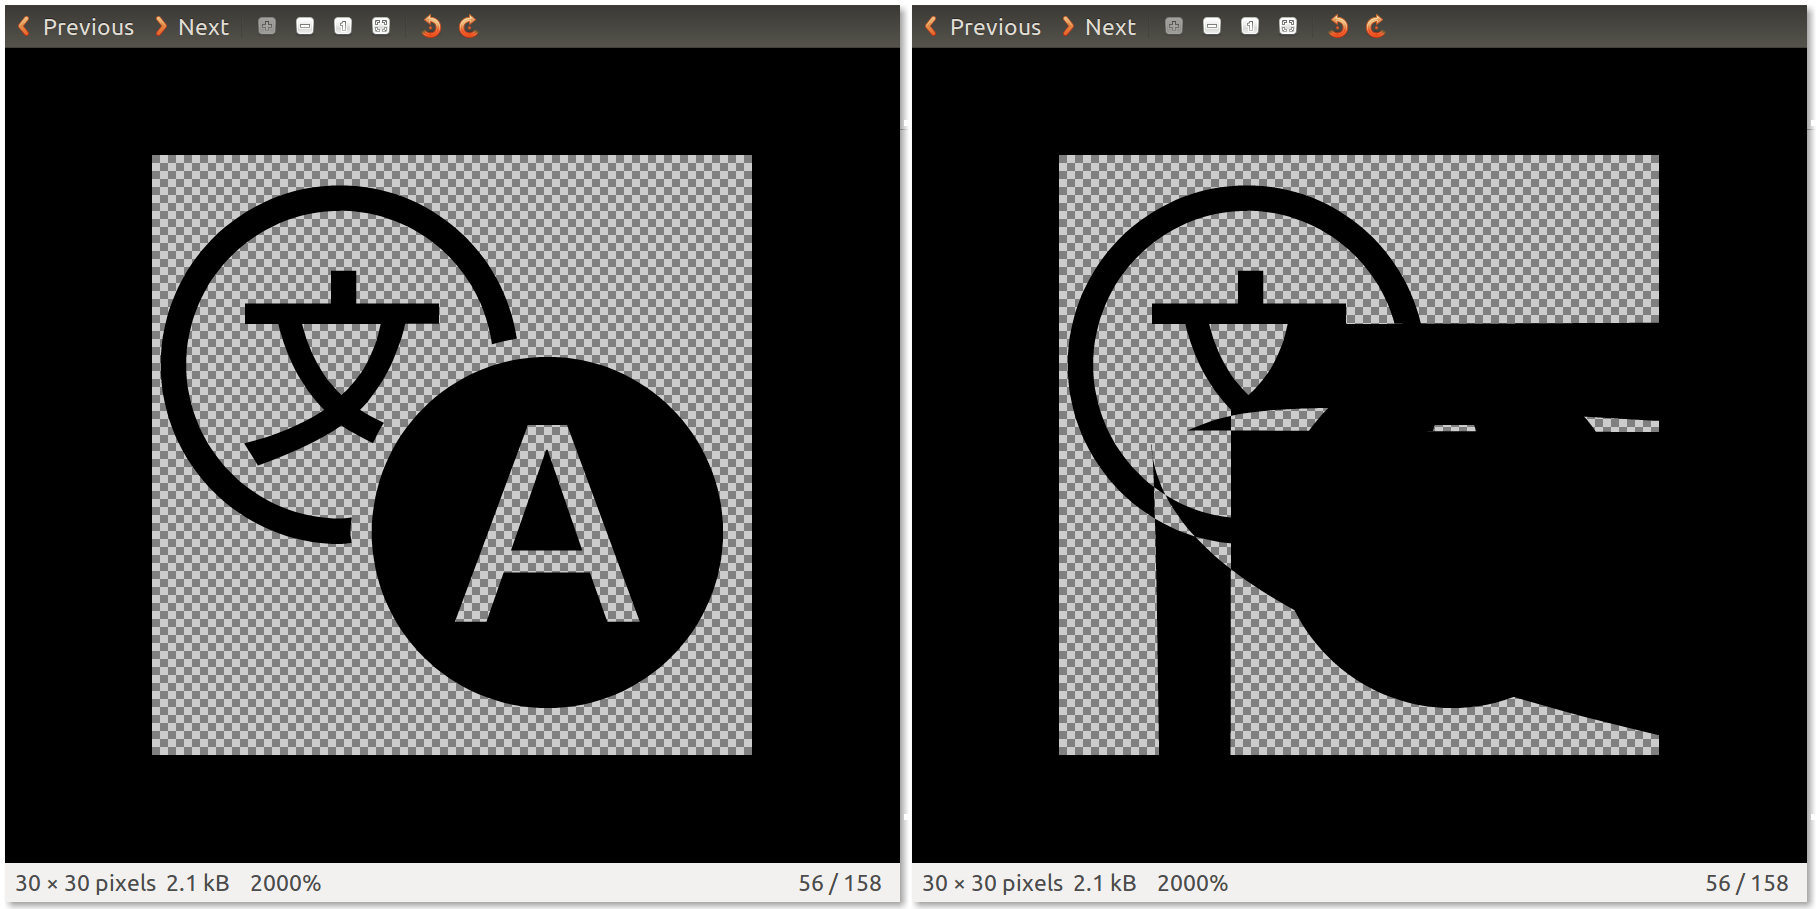 Optimising SVG images - Mozilla Hacks - the Web developer blog